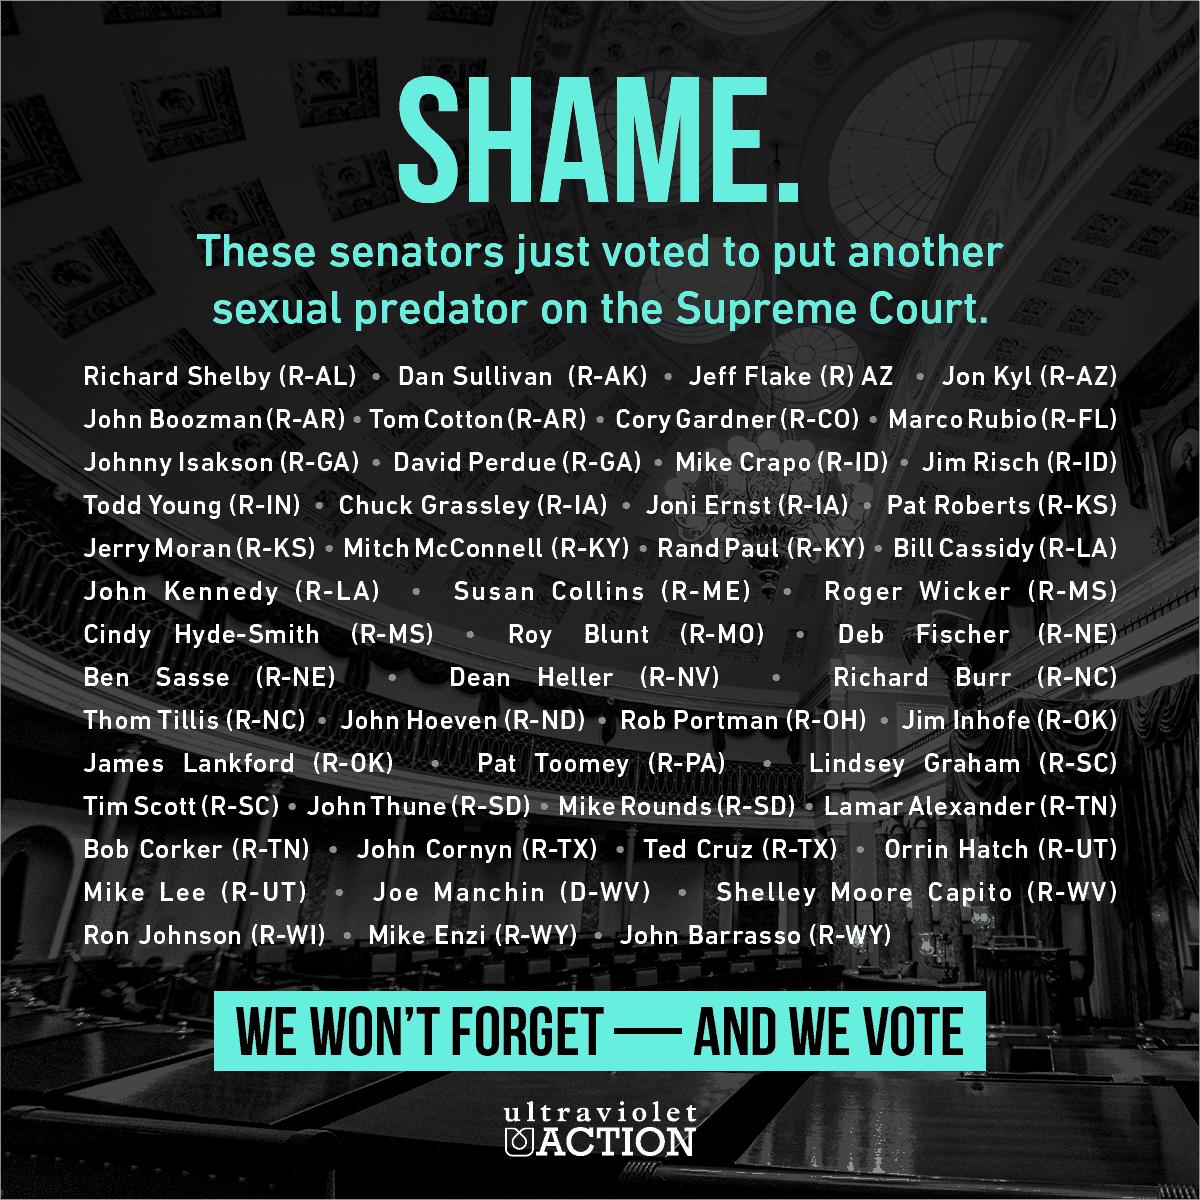 The list of senators who confirmed Kavanaugh